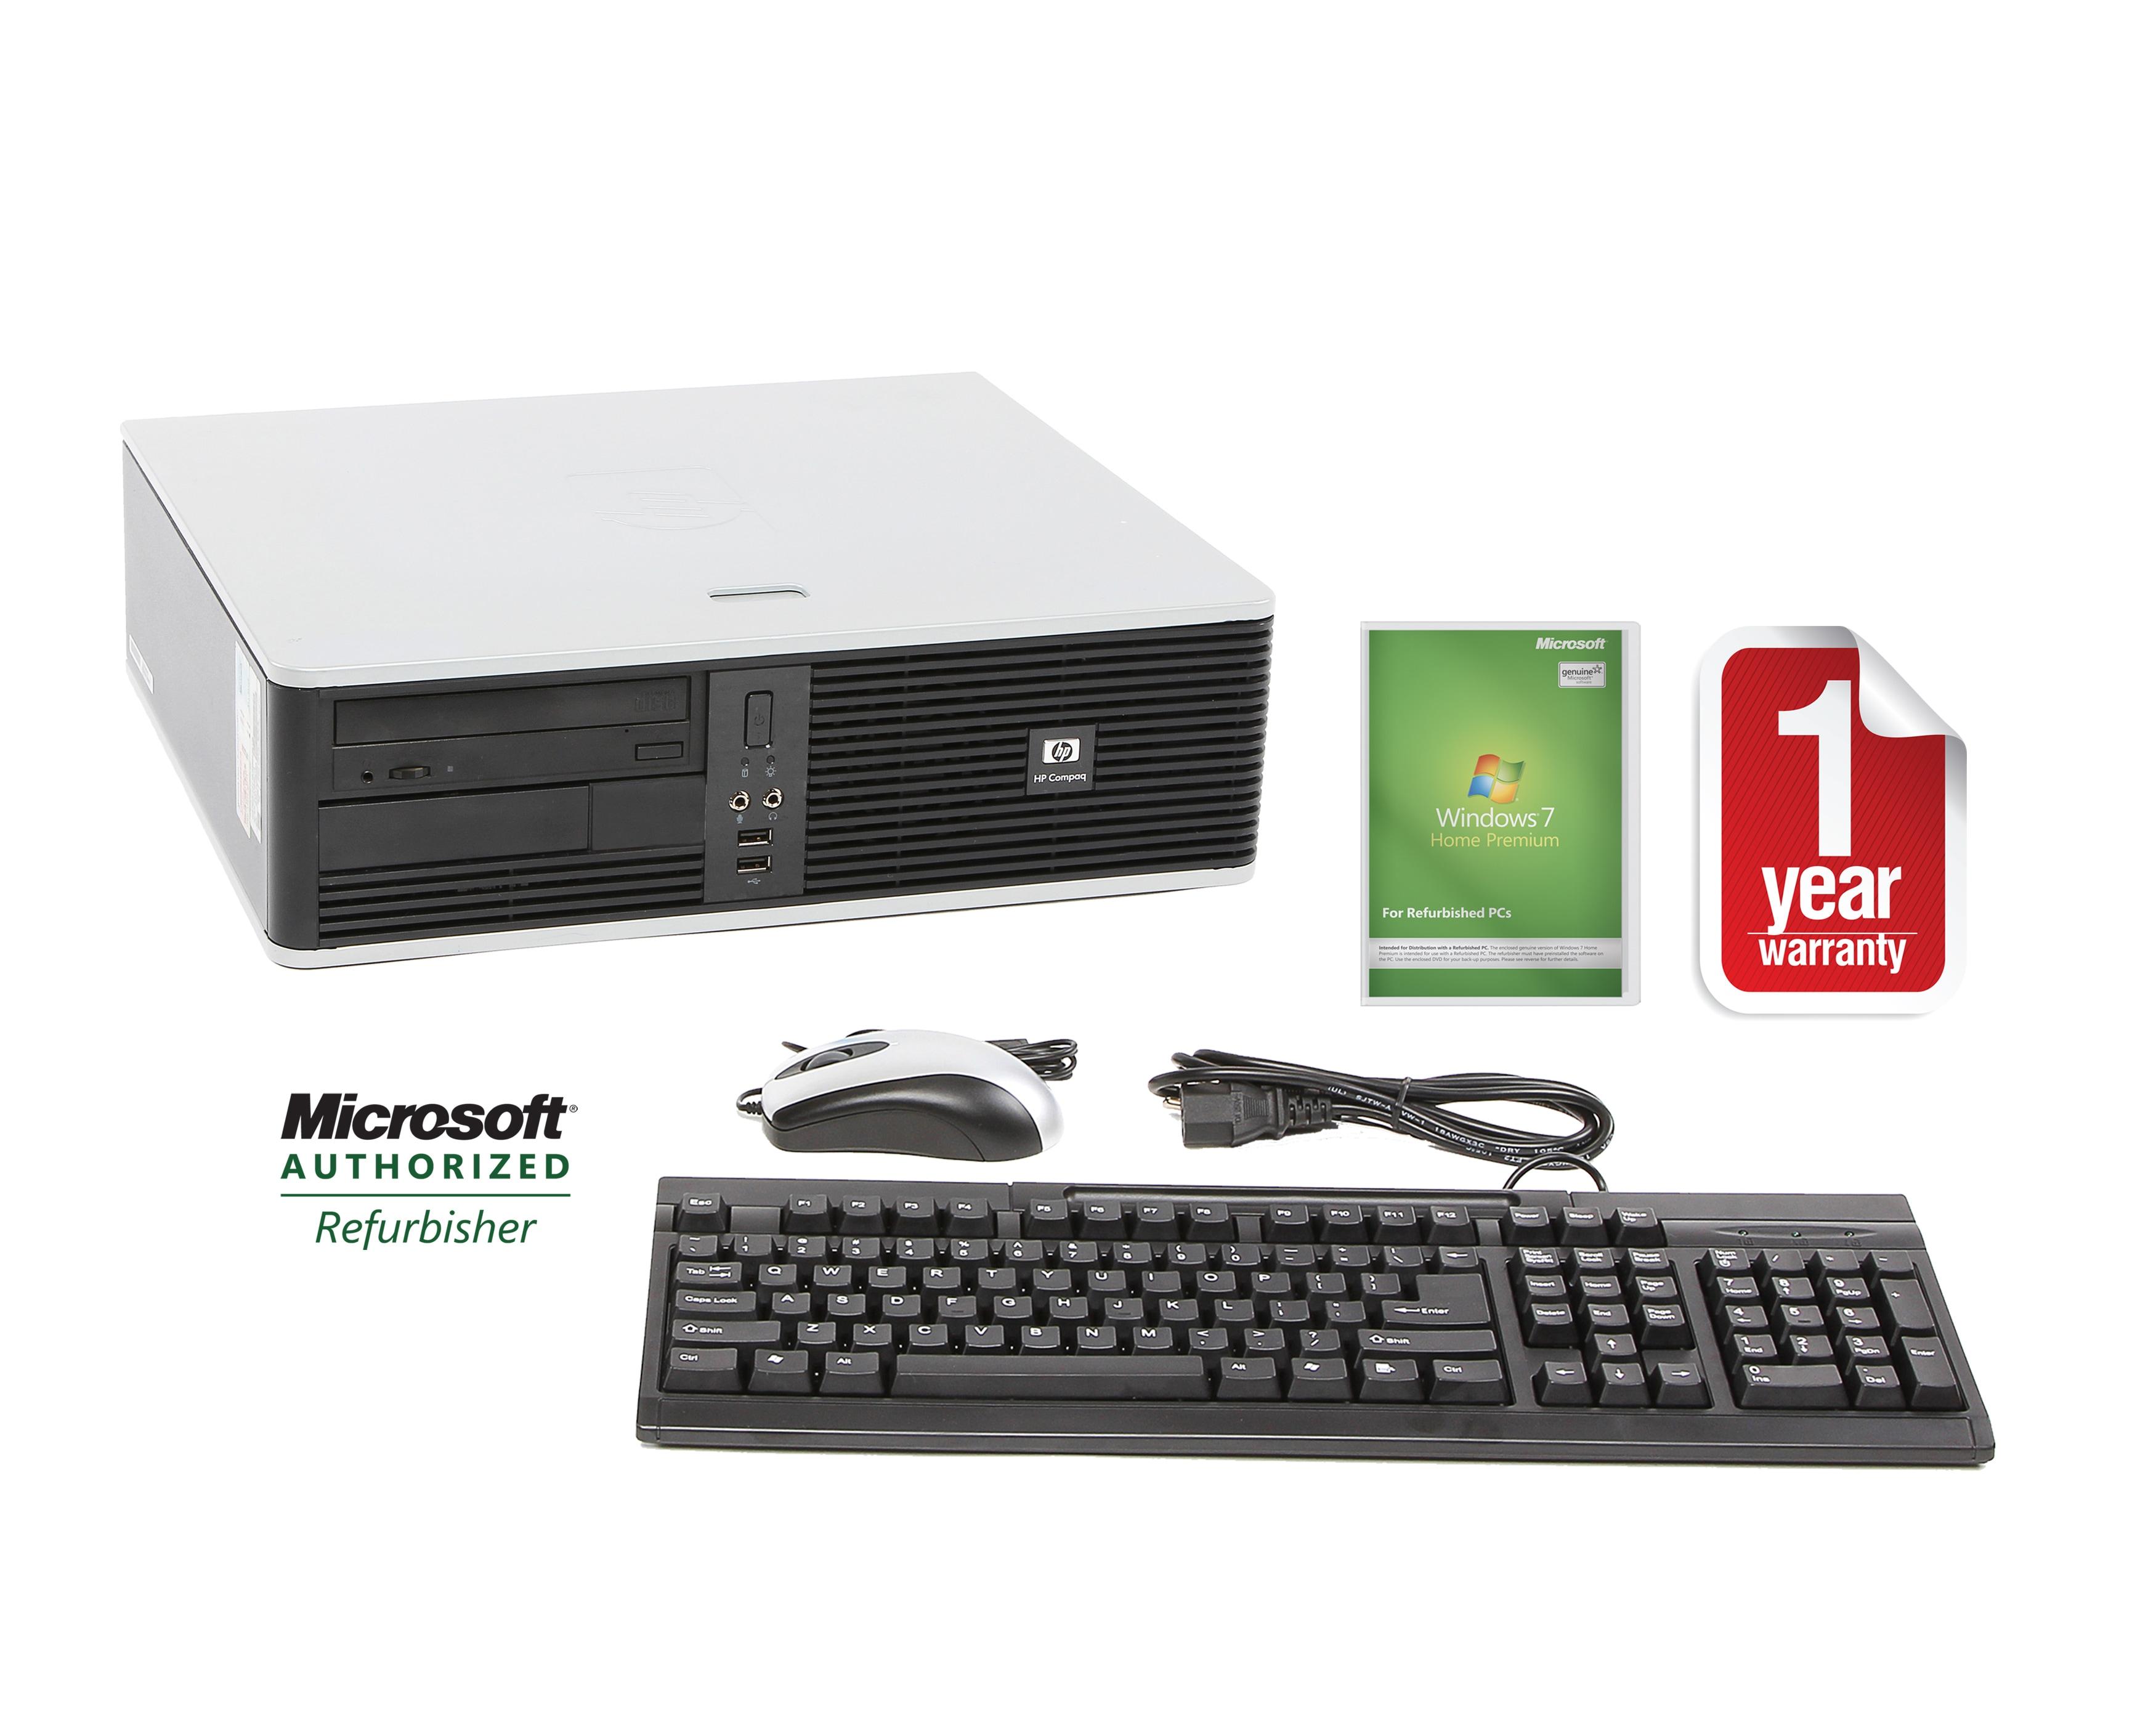 HP DC5800 1.6GHz 160GB SFF Desktop Computer (Refurbished)